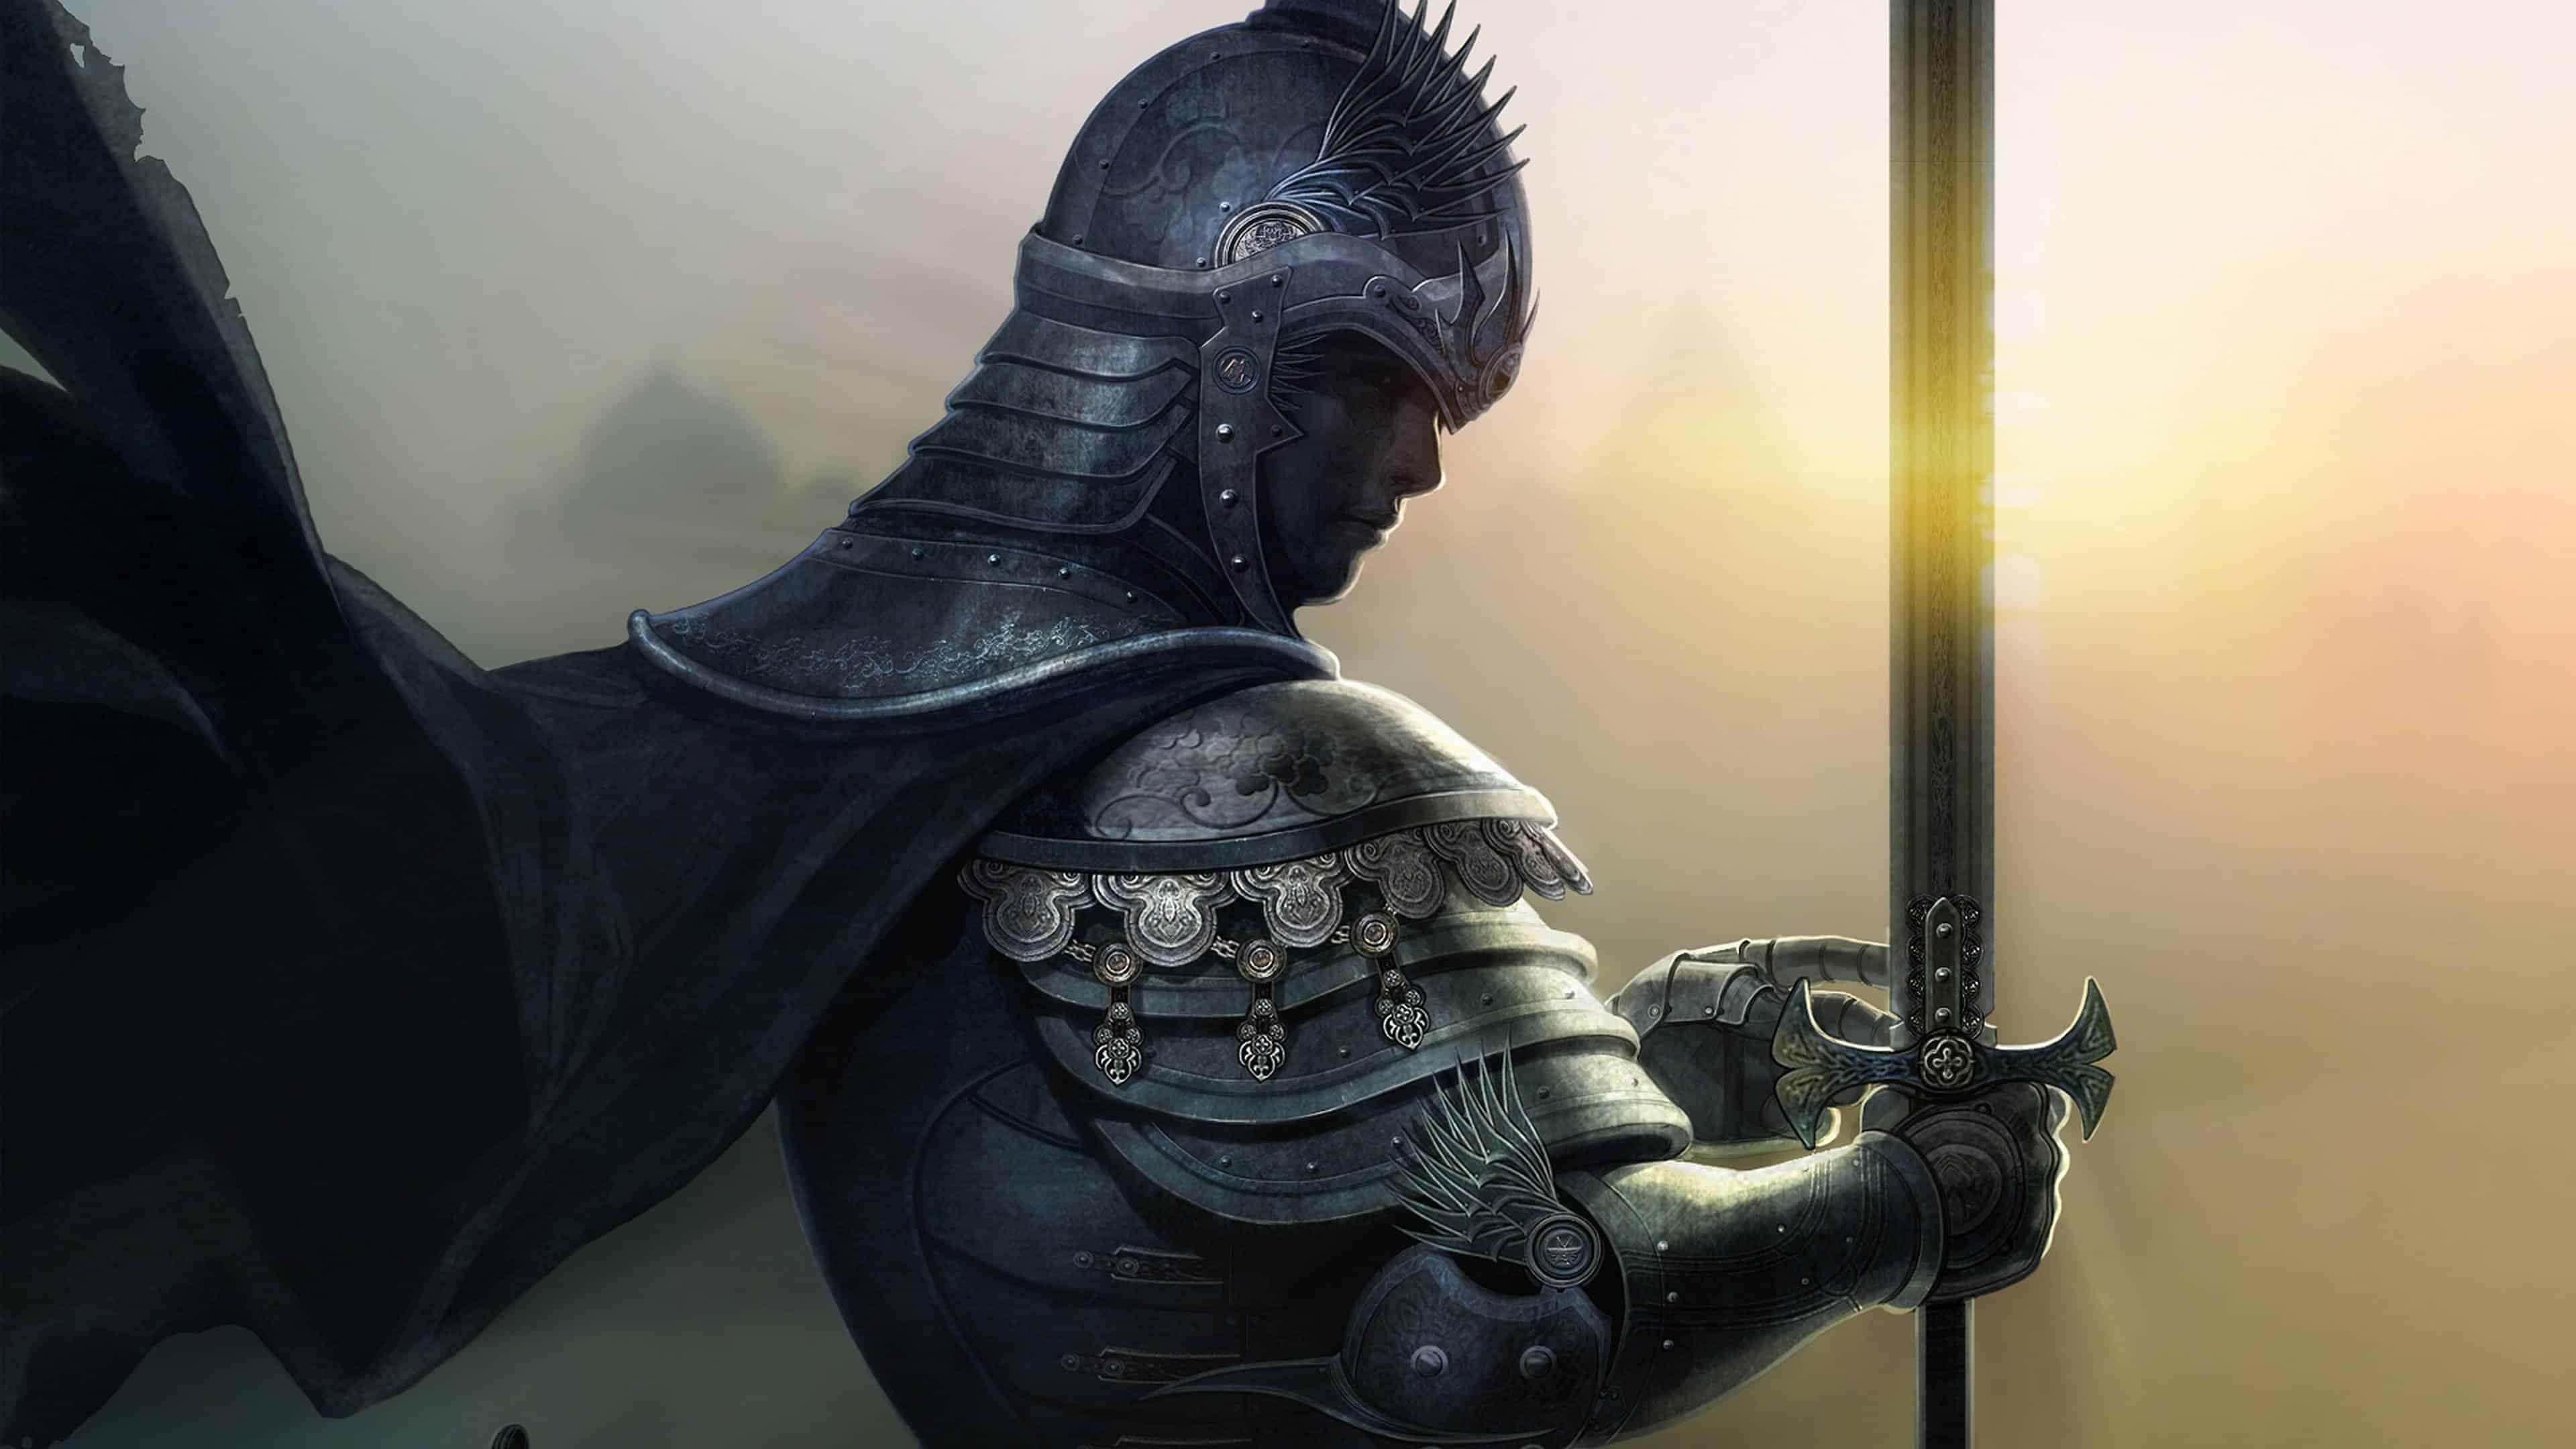 sword of the morning uhd 4k wallpaper